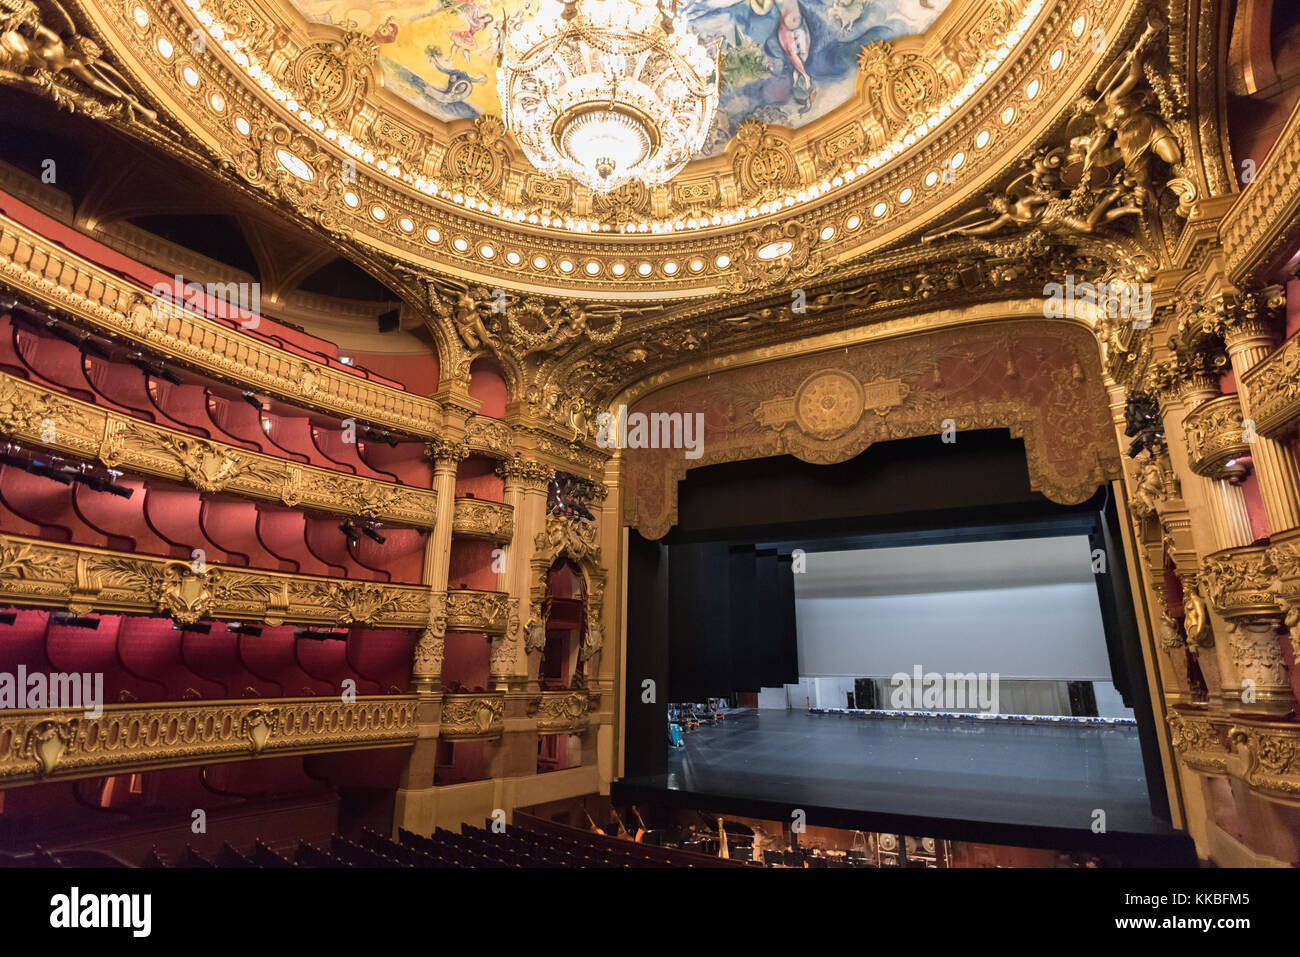 Interior of the auditorium of the Palais Garnier, Paris - Stock Image